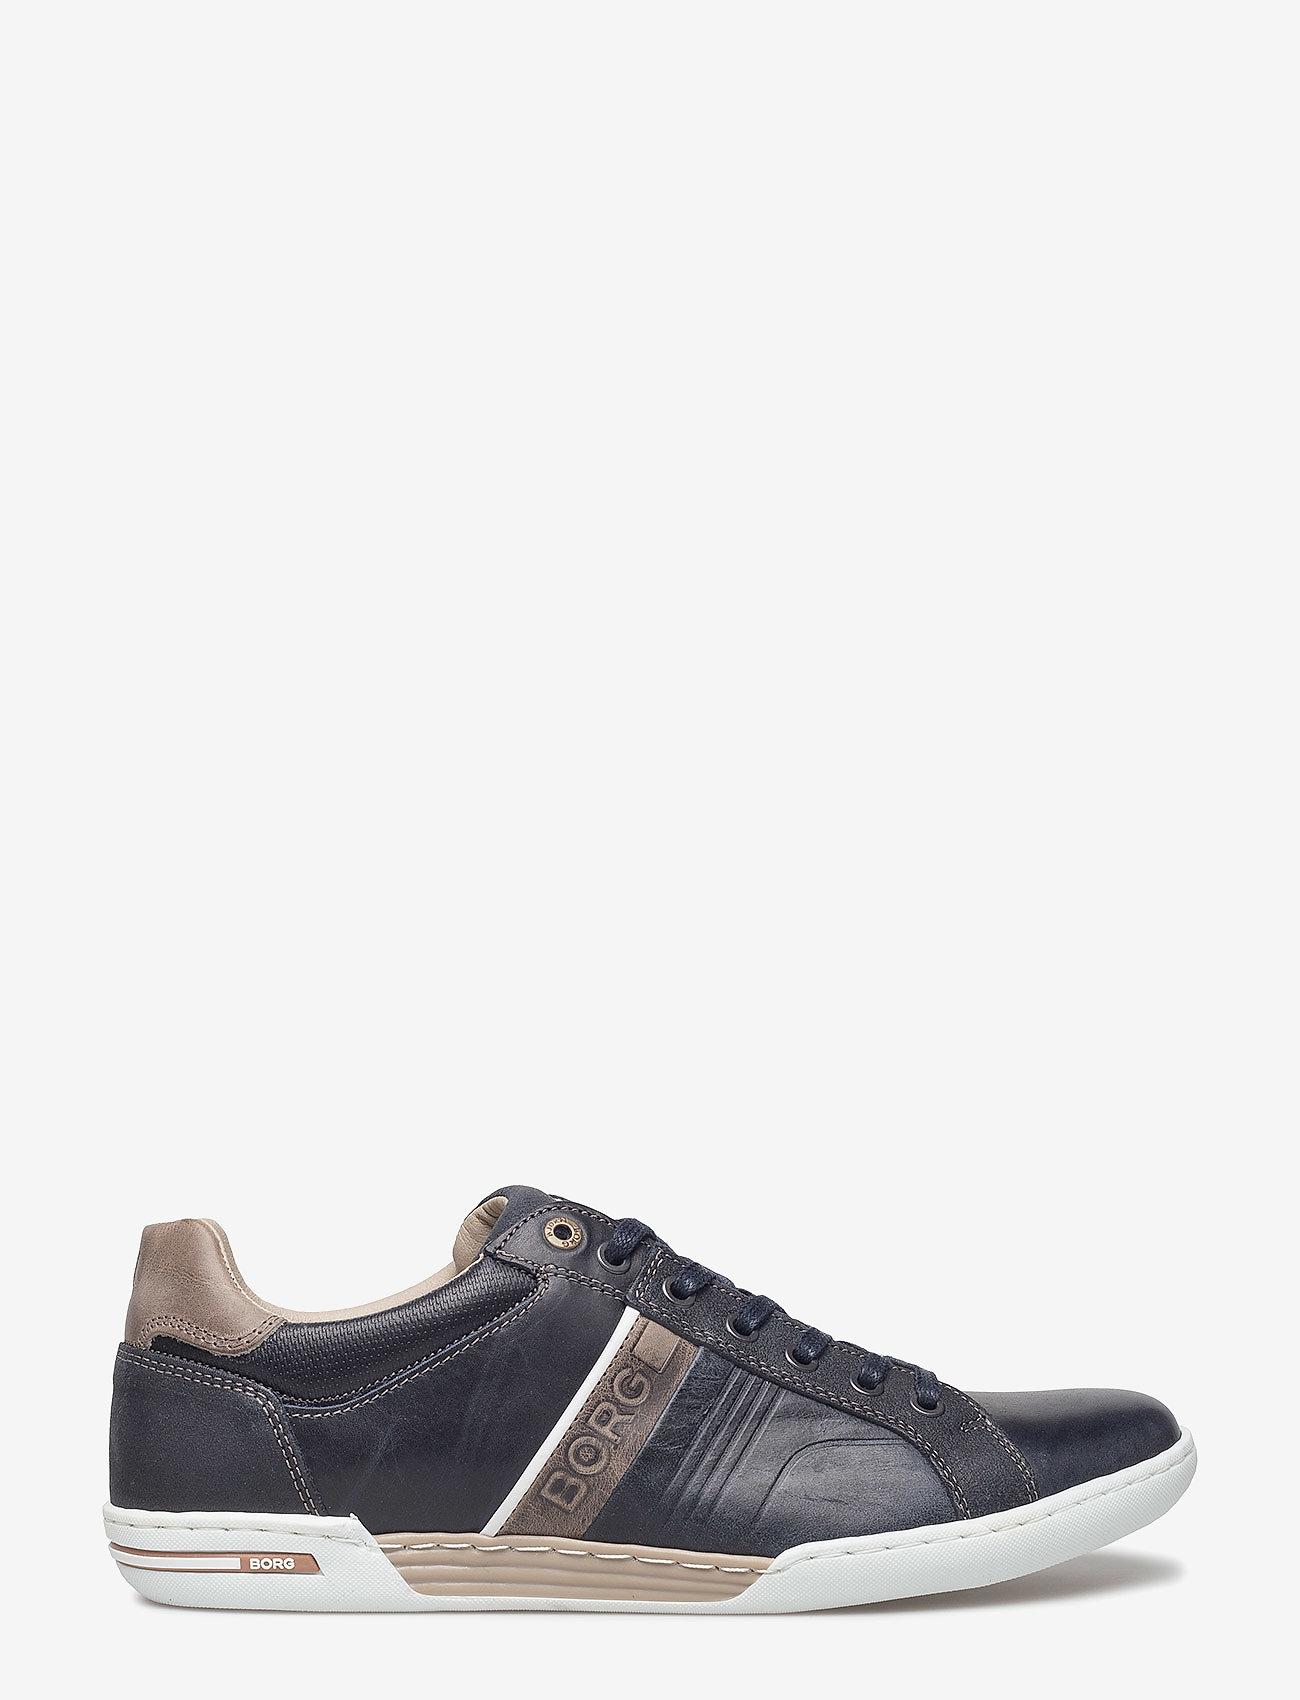 Björn Borg - Coltrane Nu Trm M - laag sneakers - navy/grey - 1